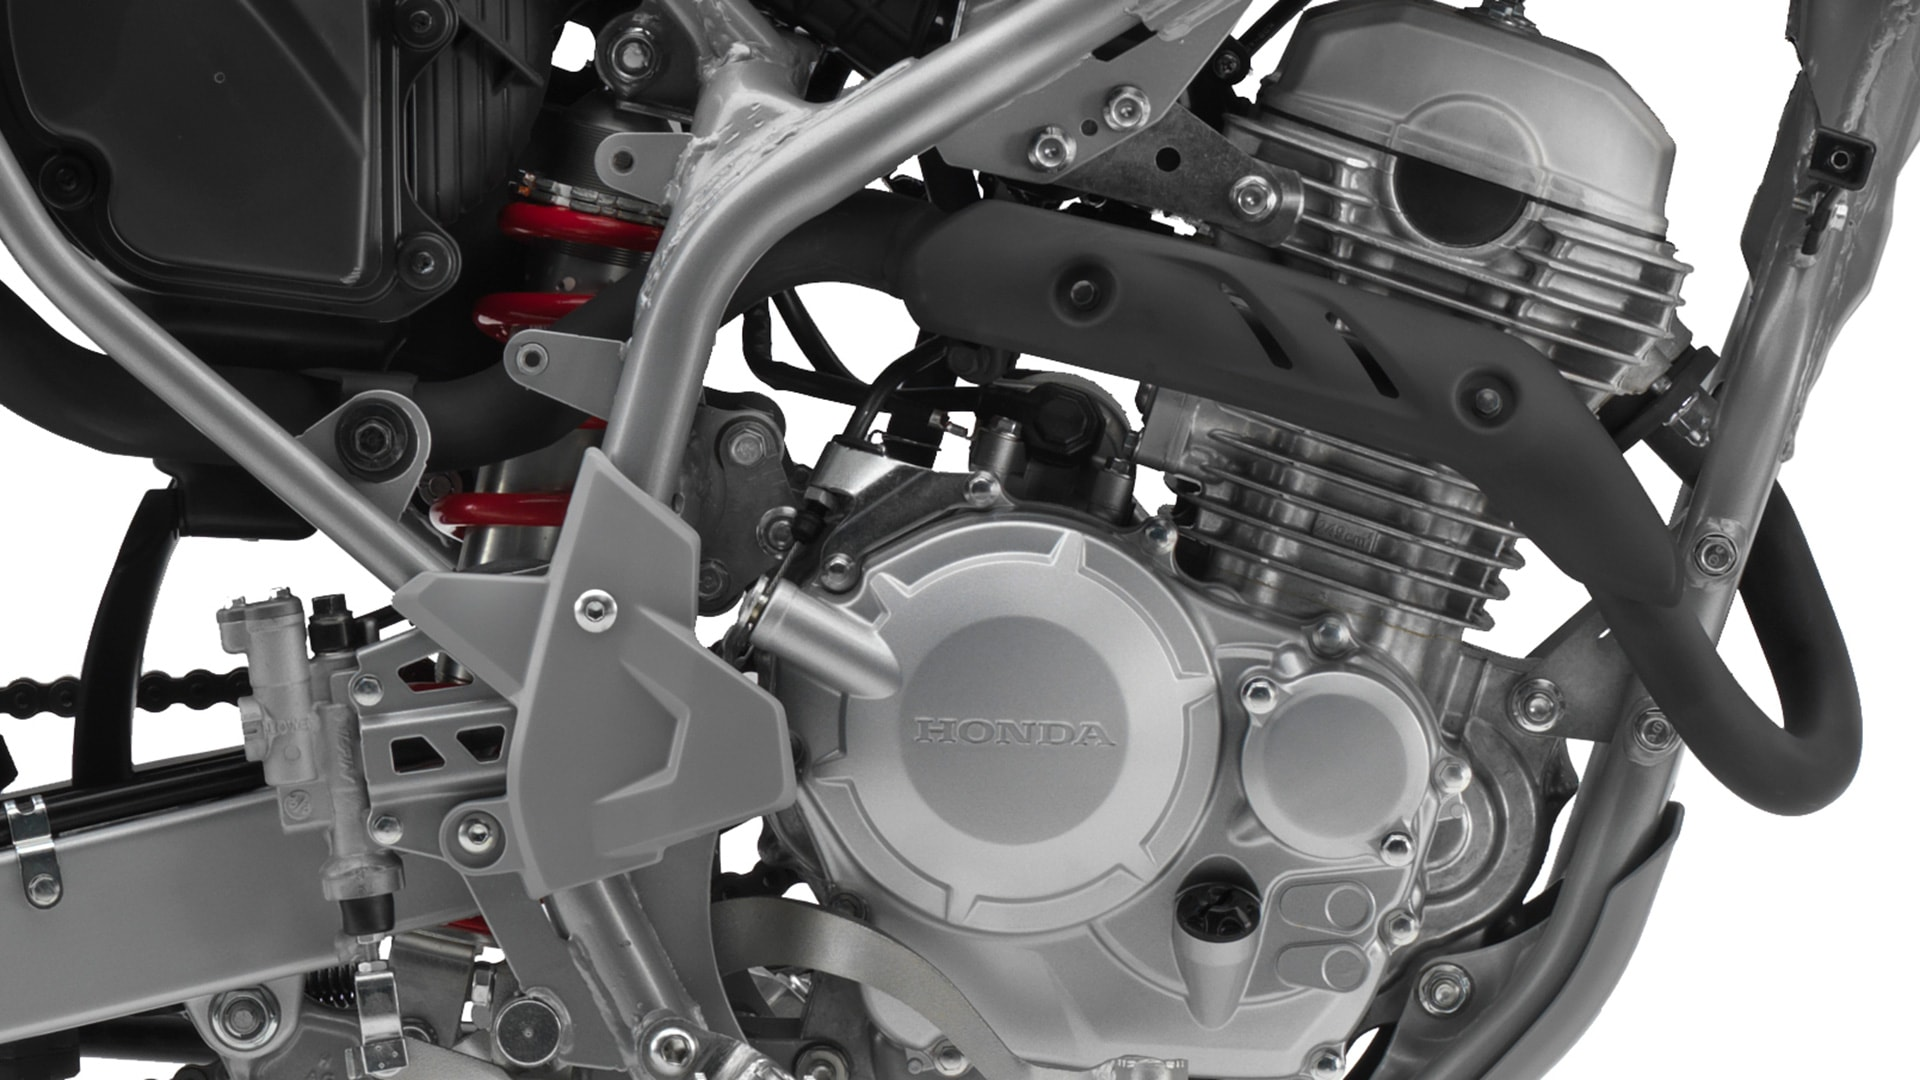 New Inventory | Schrader's, Yorkton, SK 306-783-3333|2019 Honda CRF250F